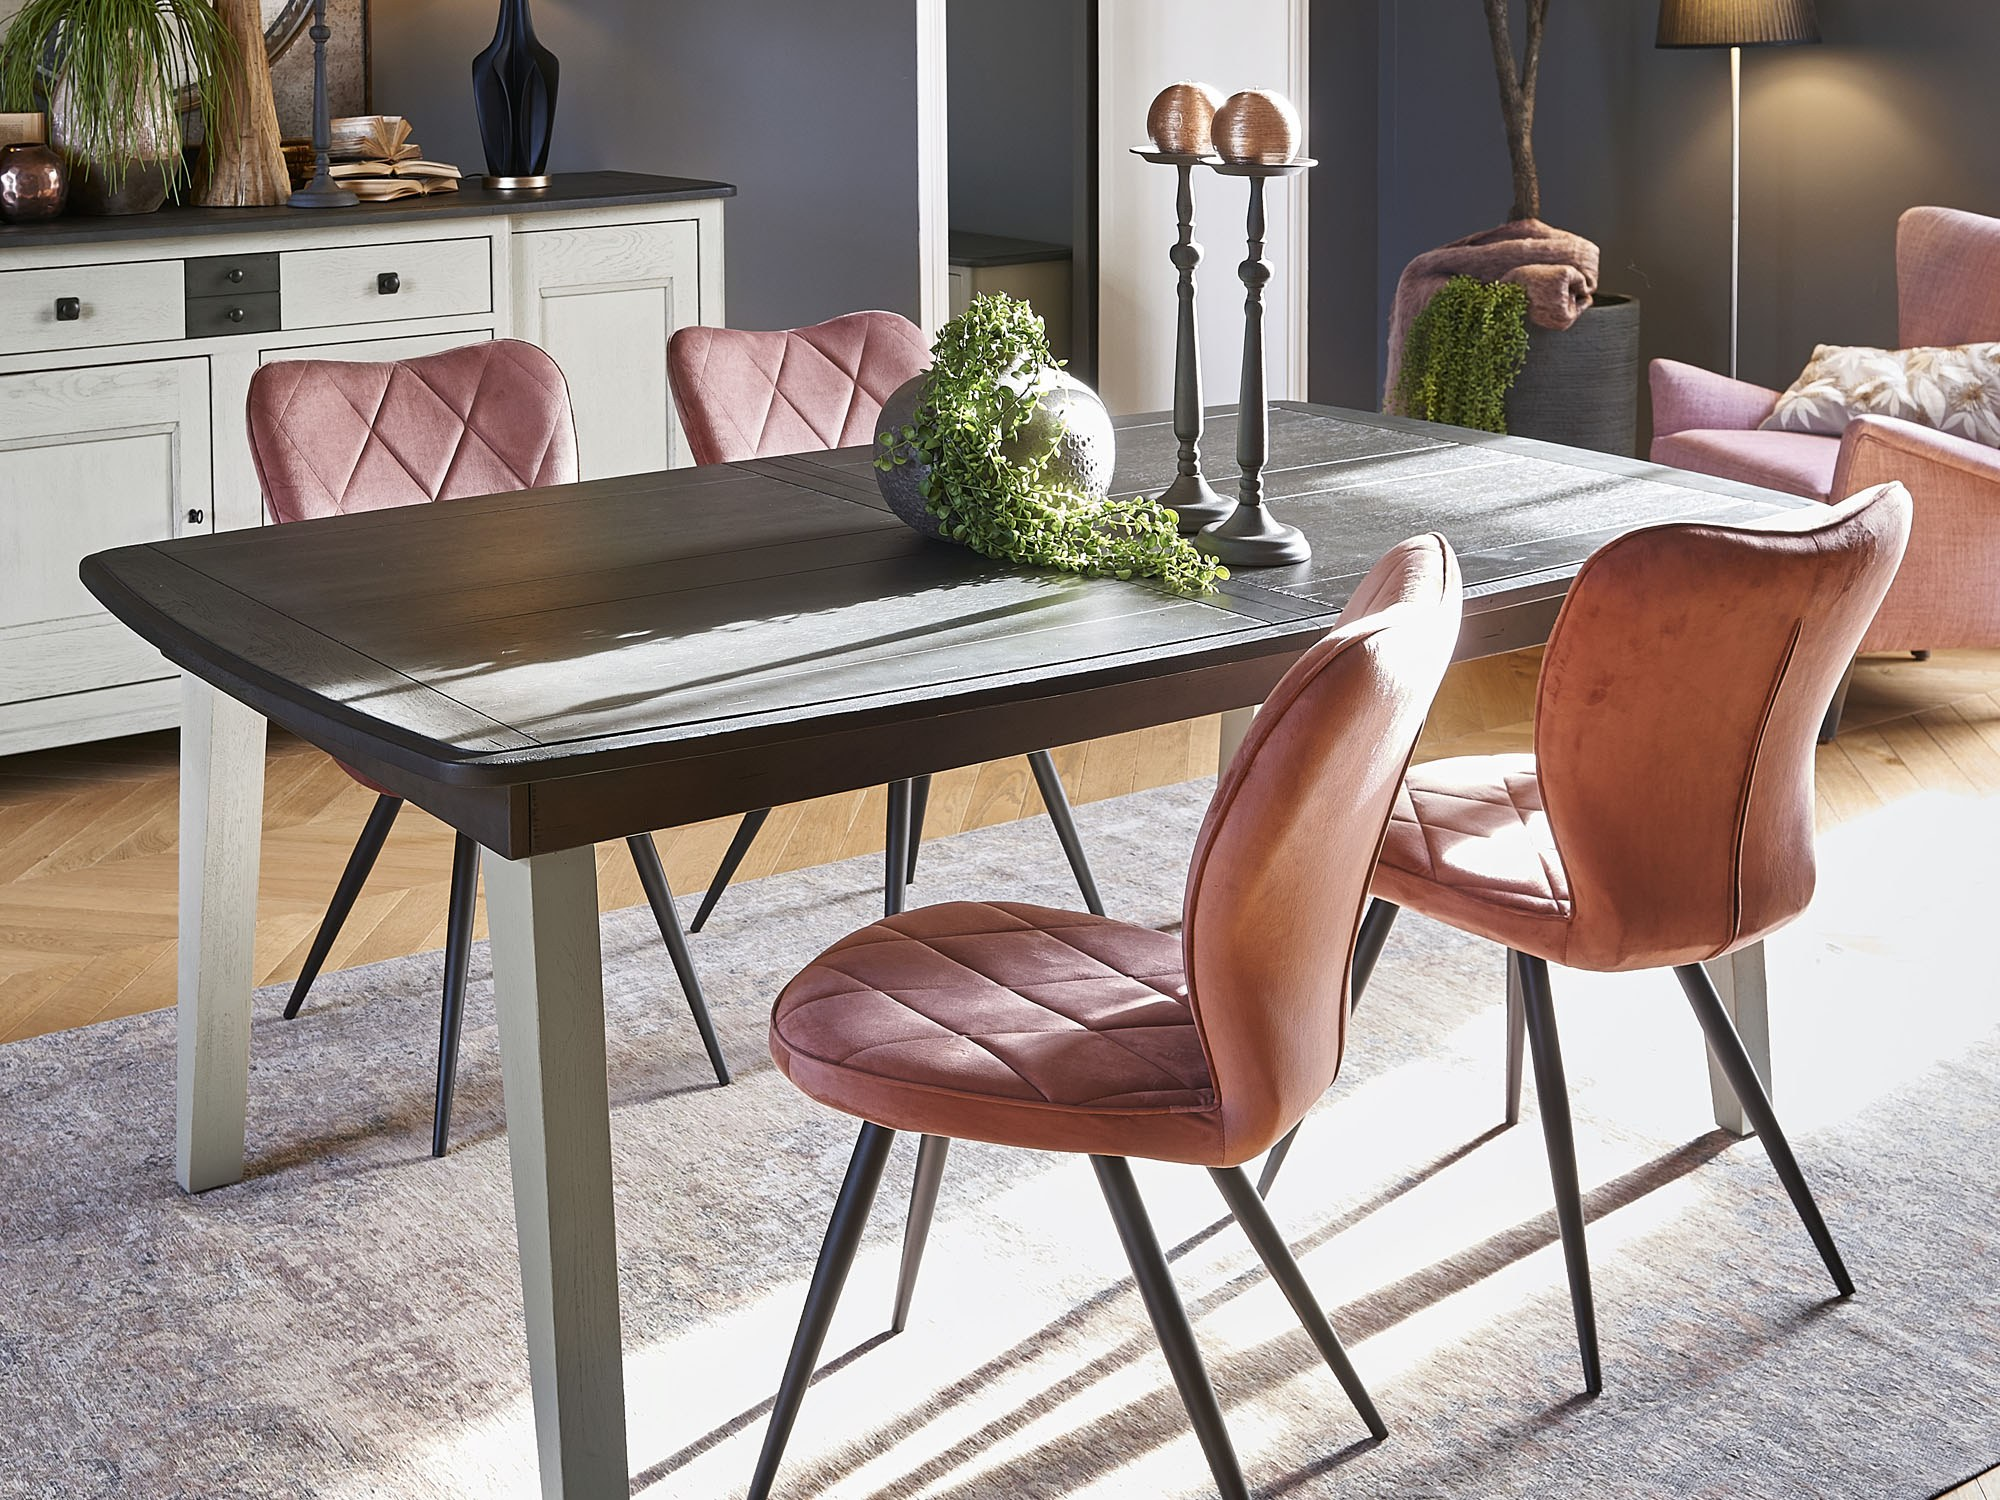 séraphine table chêne massif pieds bois